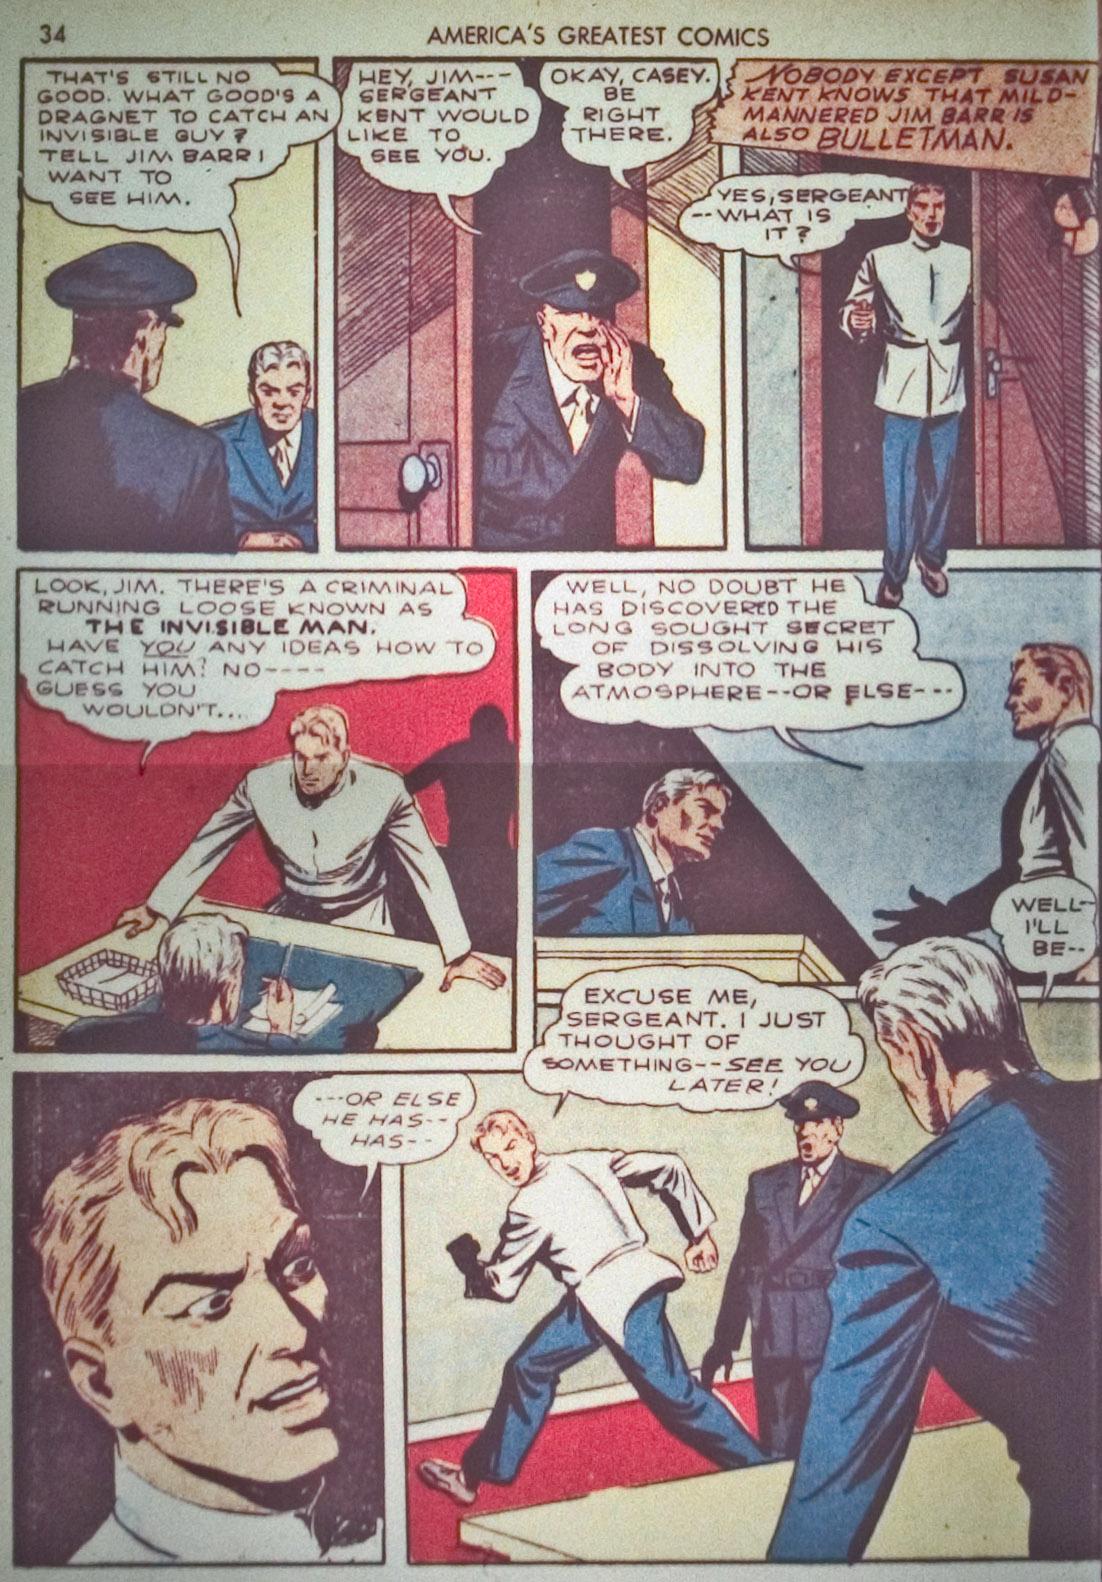 Read online America's Greatest Comics comic -  Issue #1 - 37